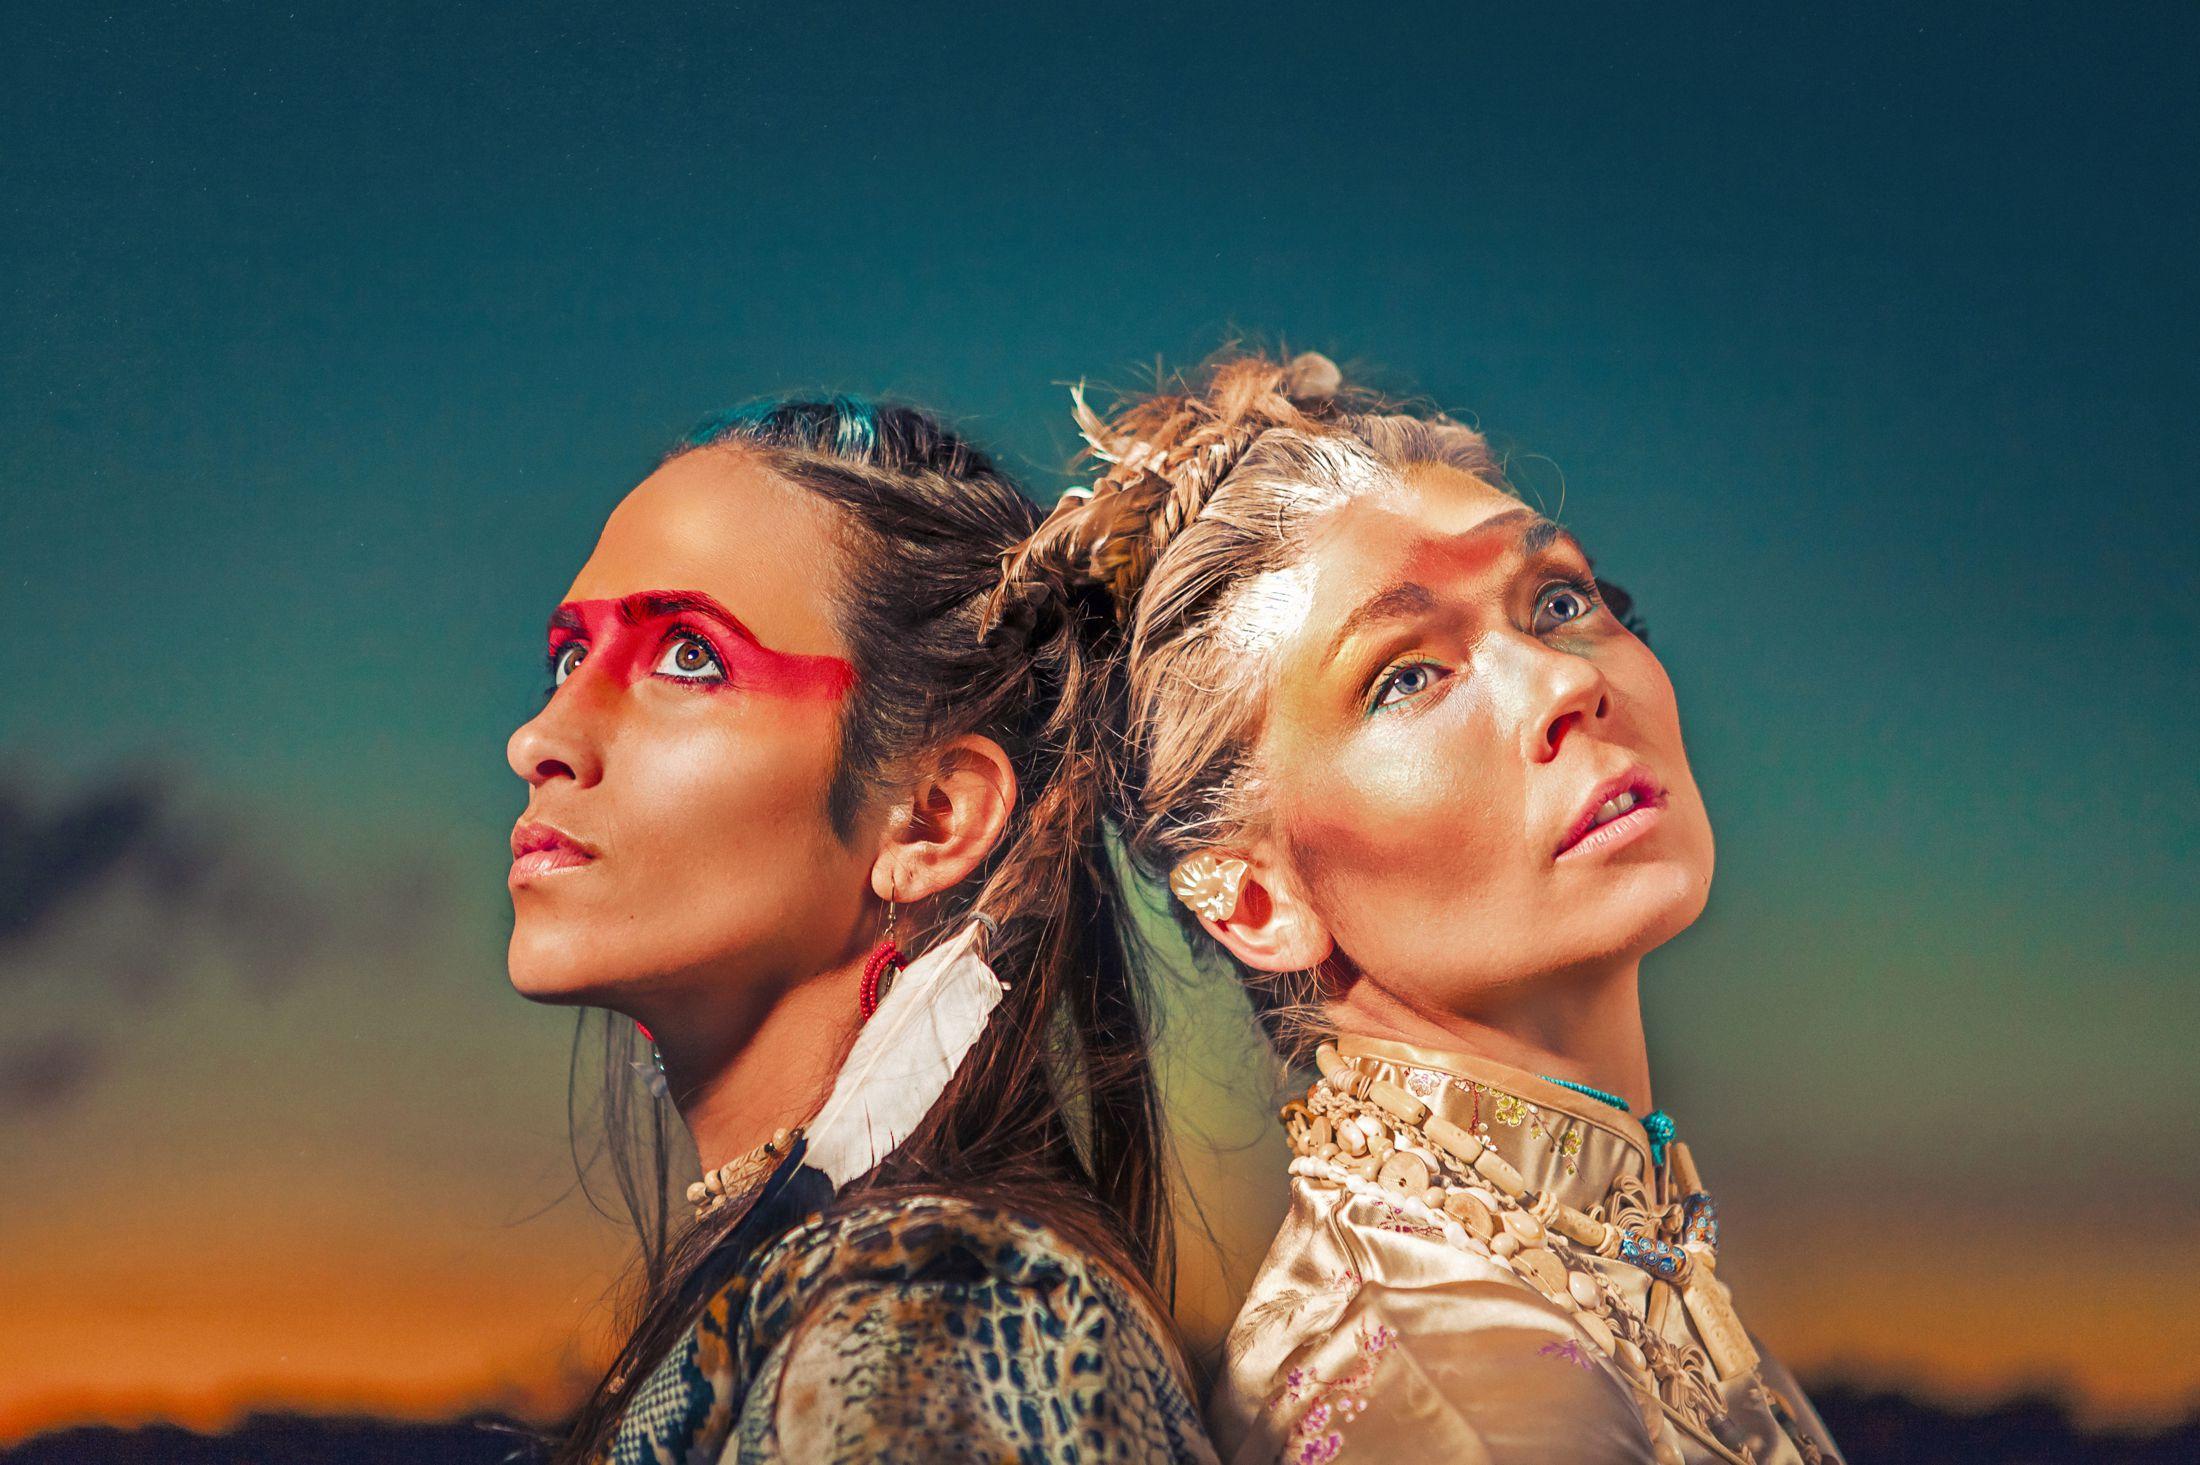 Electric Forest yoga LED light nomad festival style ethnic global fashion shoot warpaint tribal 22.jpg